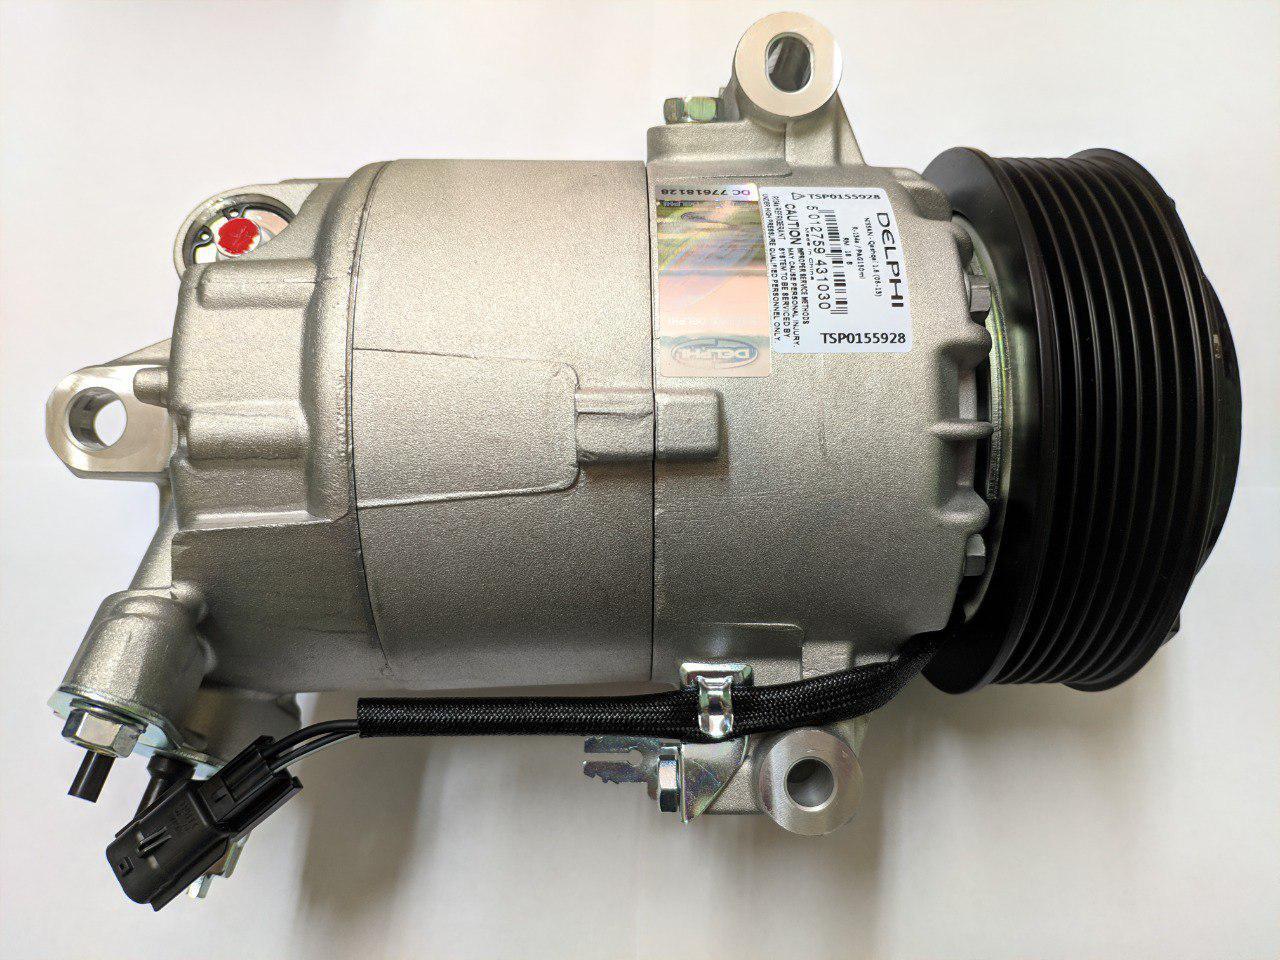 Компрессор кондиционера Renault Master, Opel Movano 2.3, 2010-, Delphi TSP0155928